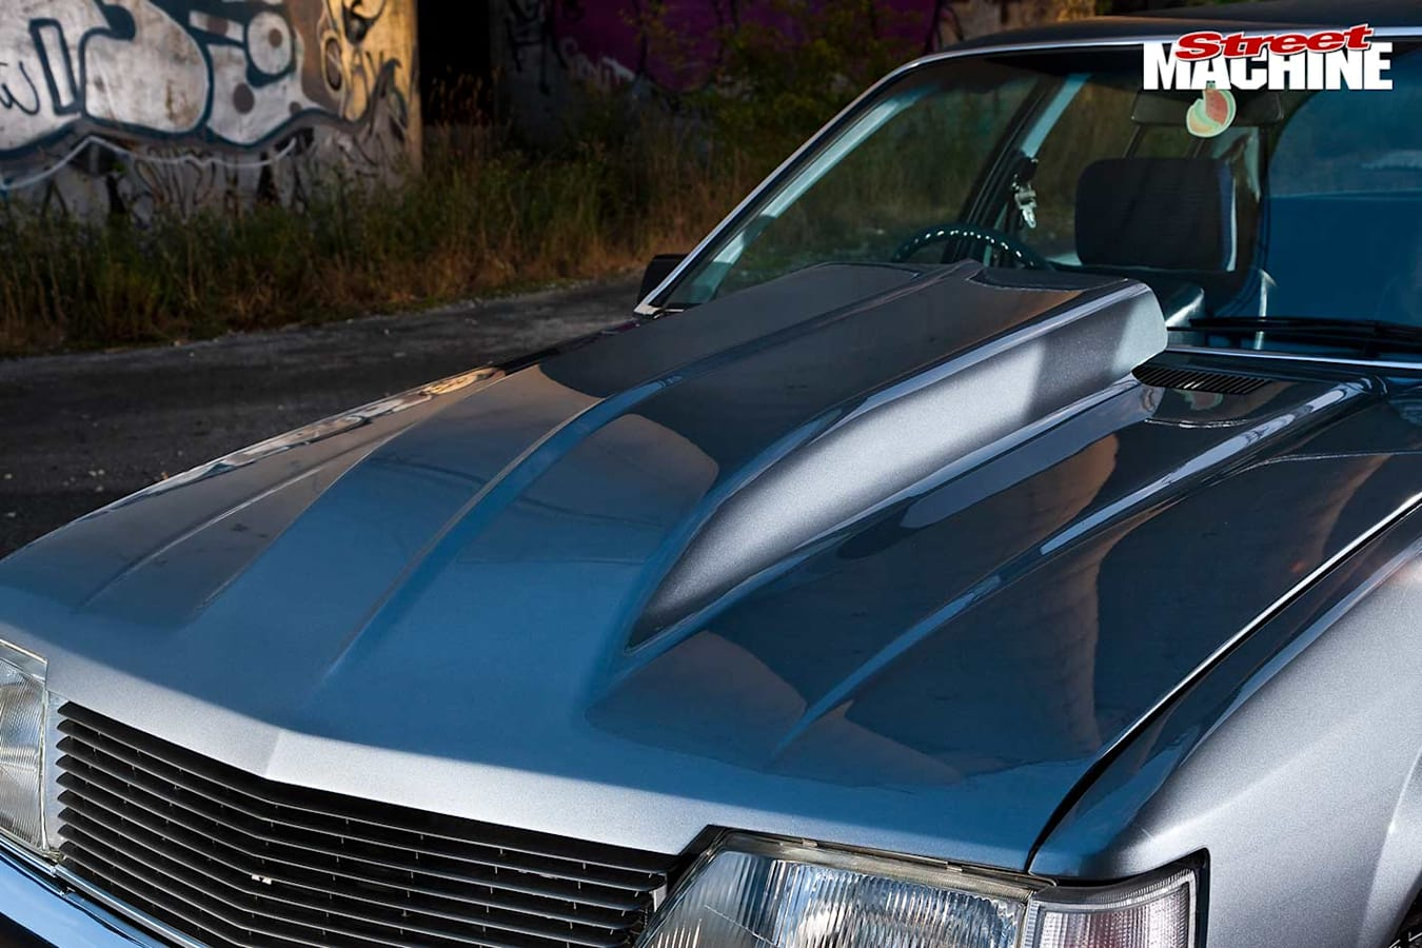 Holden VH Commodore bonnet